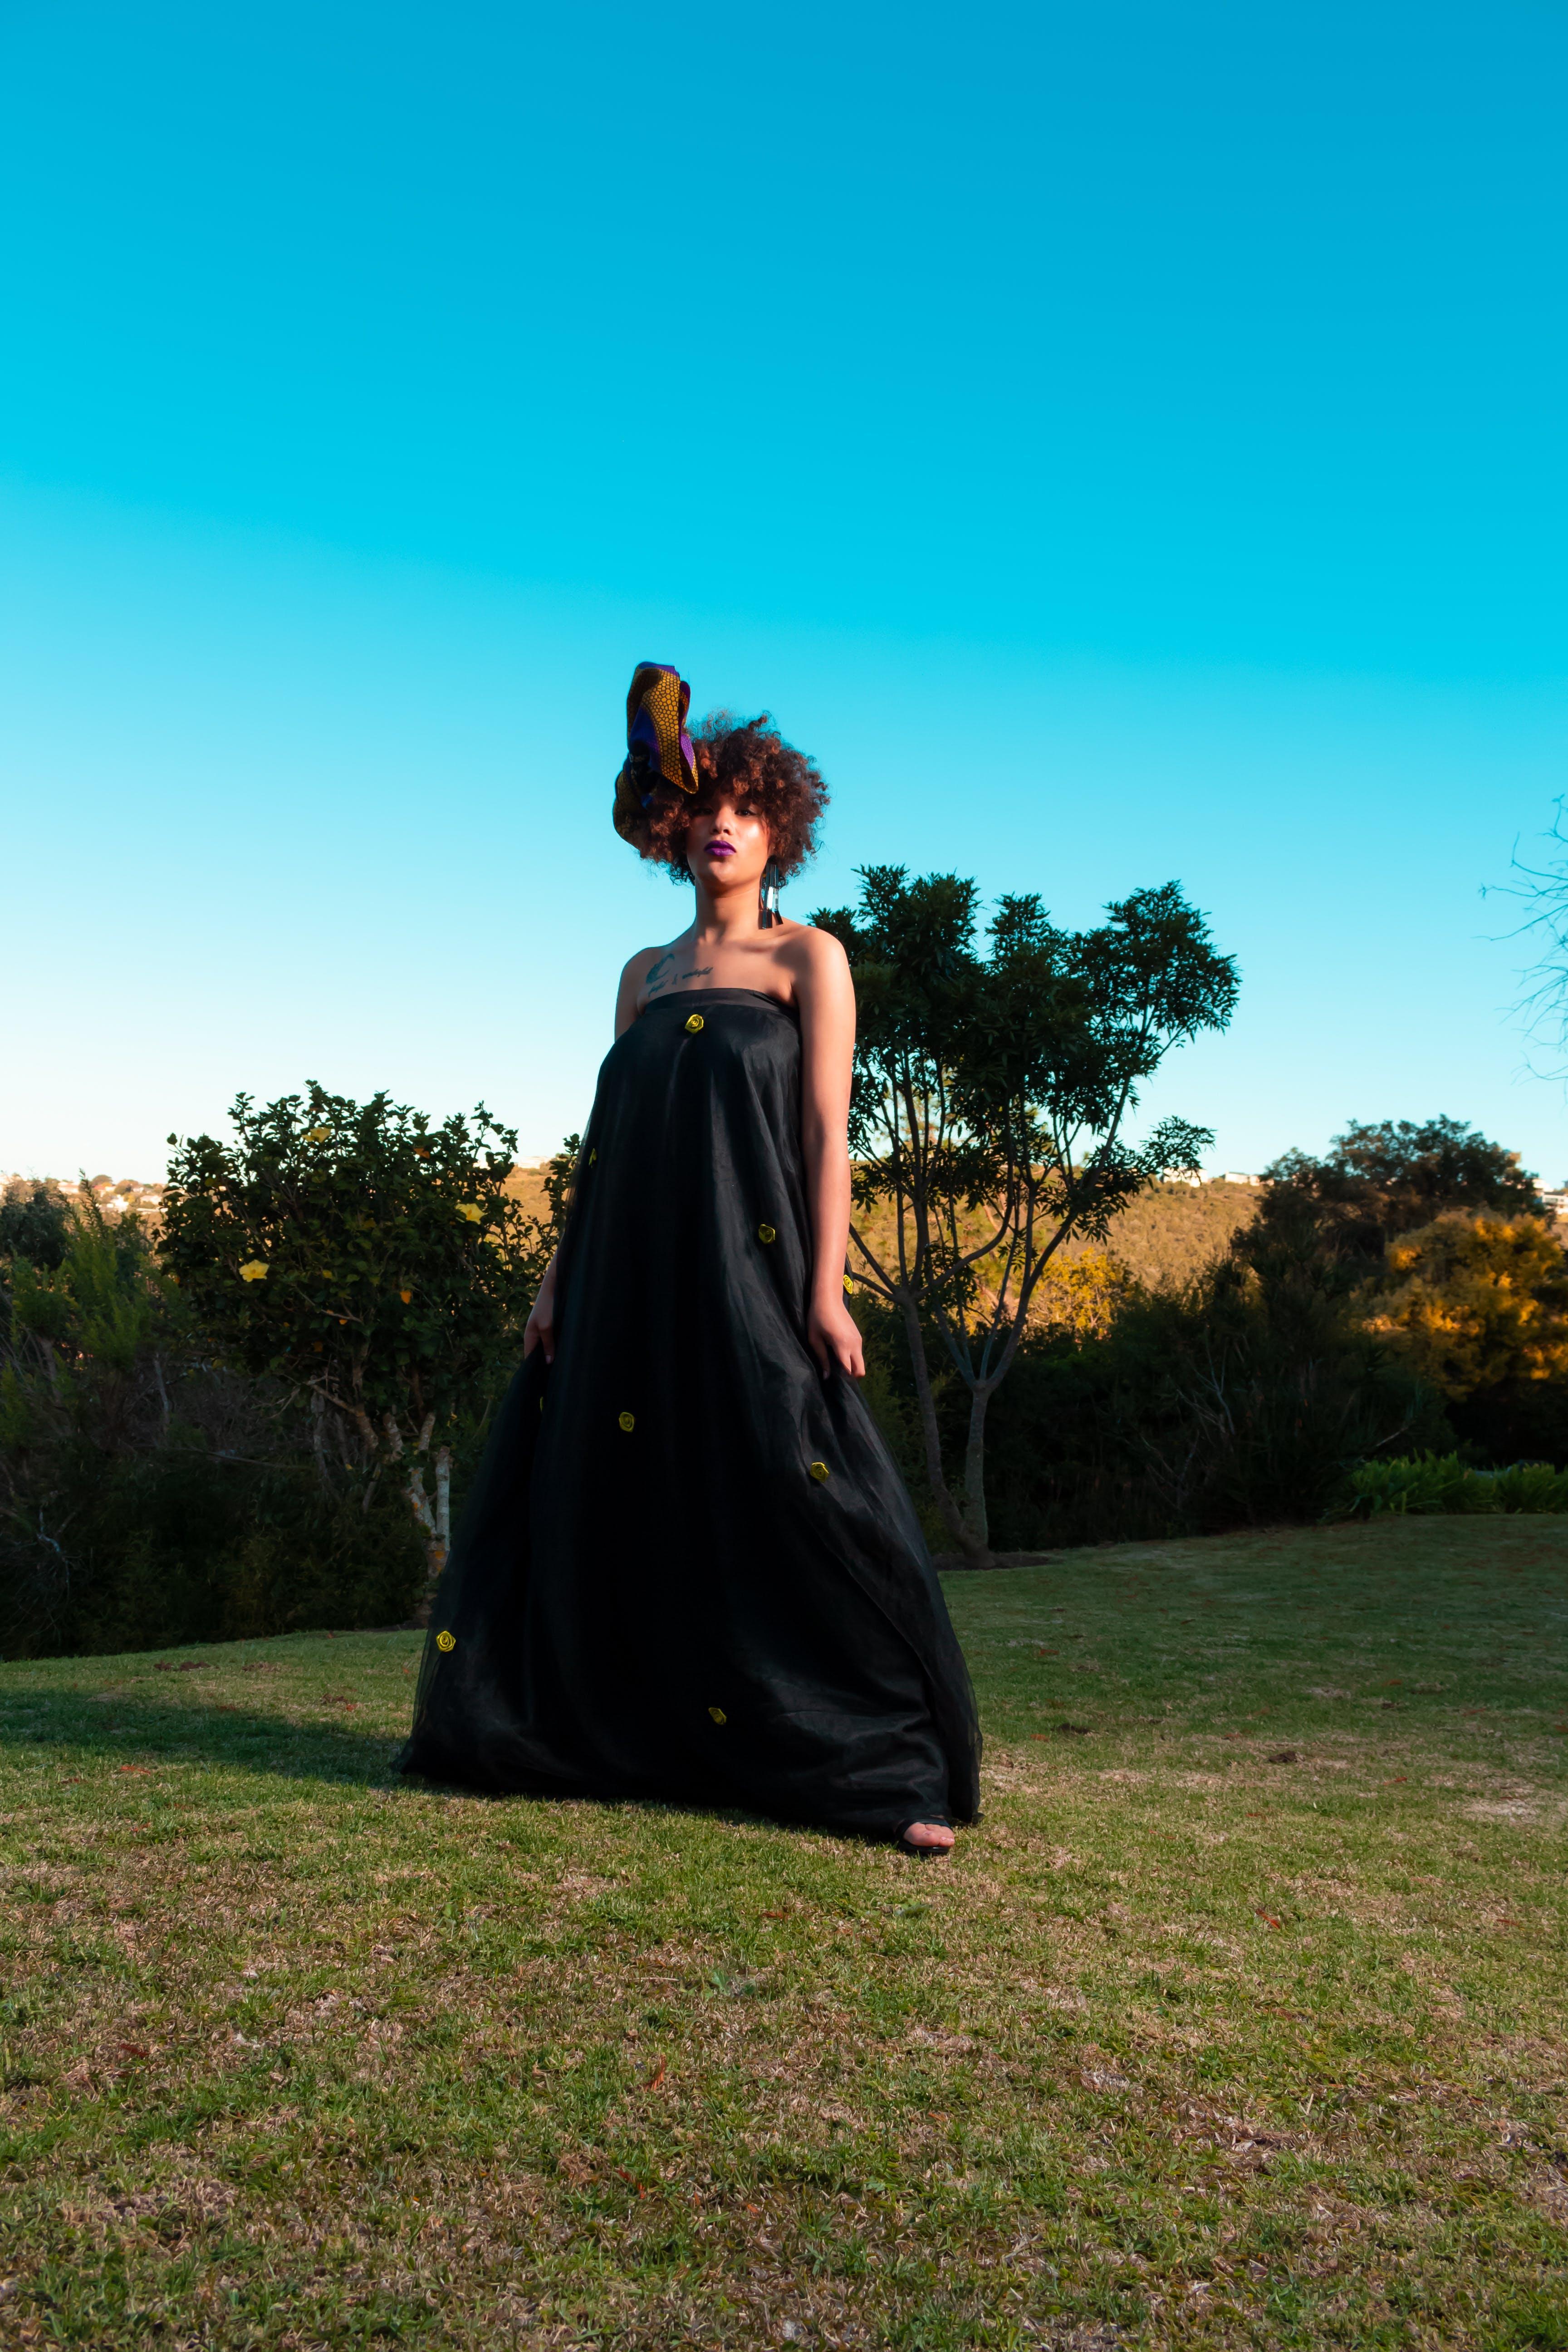 Woman In Black Tube Dress Standing On Green Grass Field